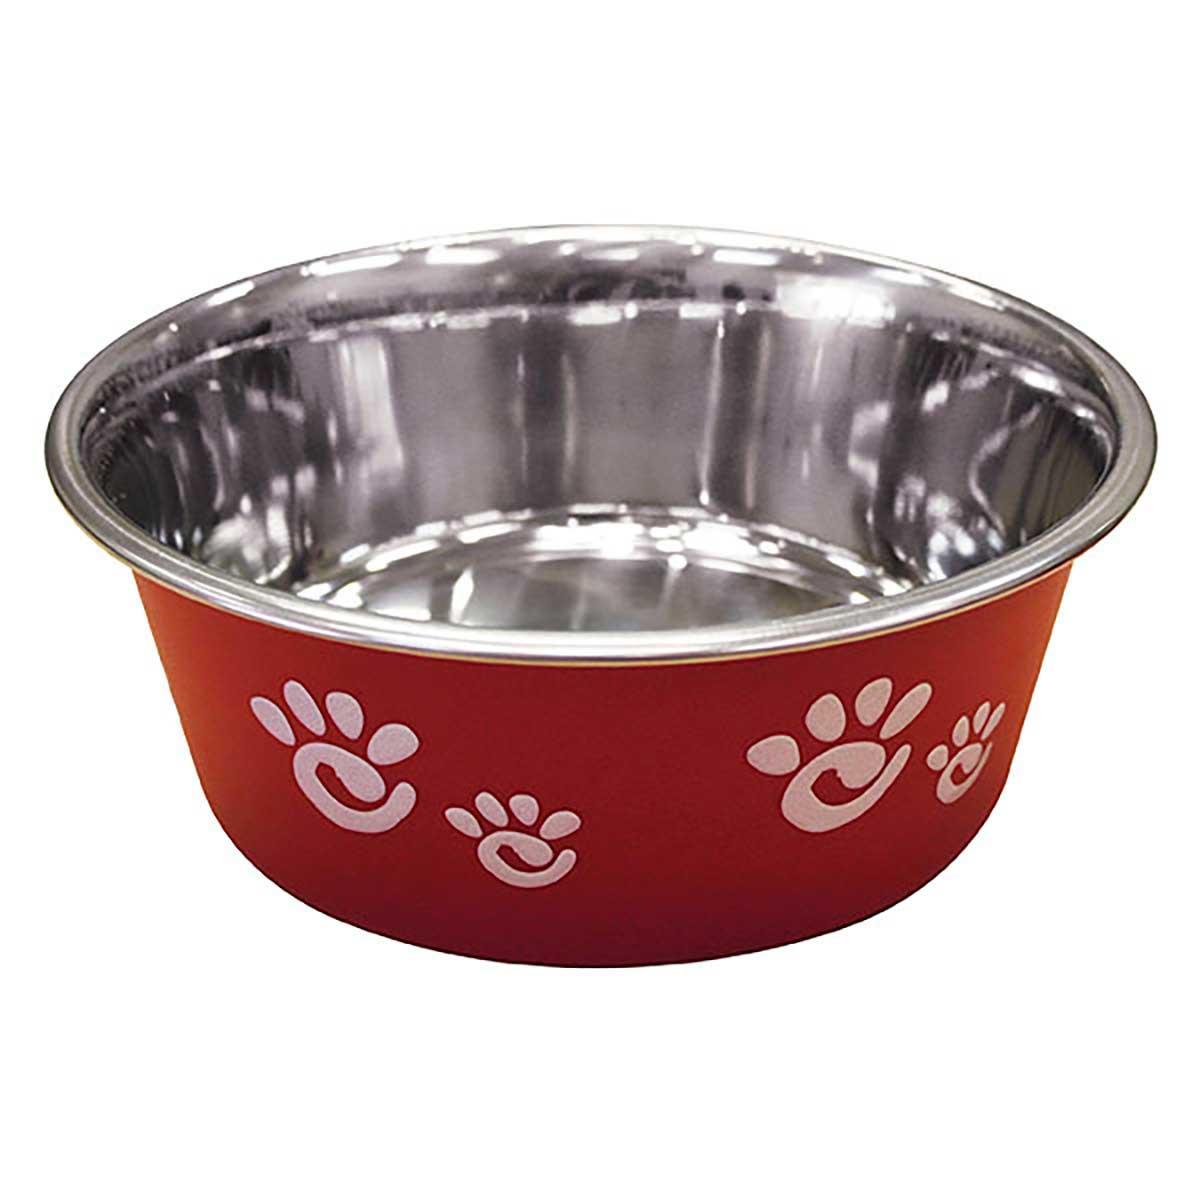 Barcelona Dog Bowl Matte Raspberry - Holds 32 oz